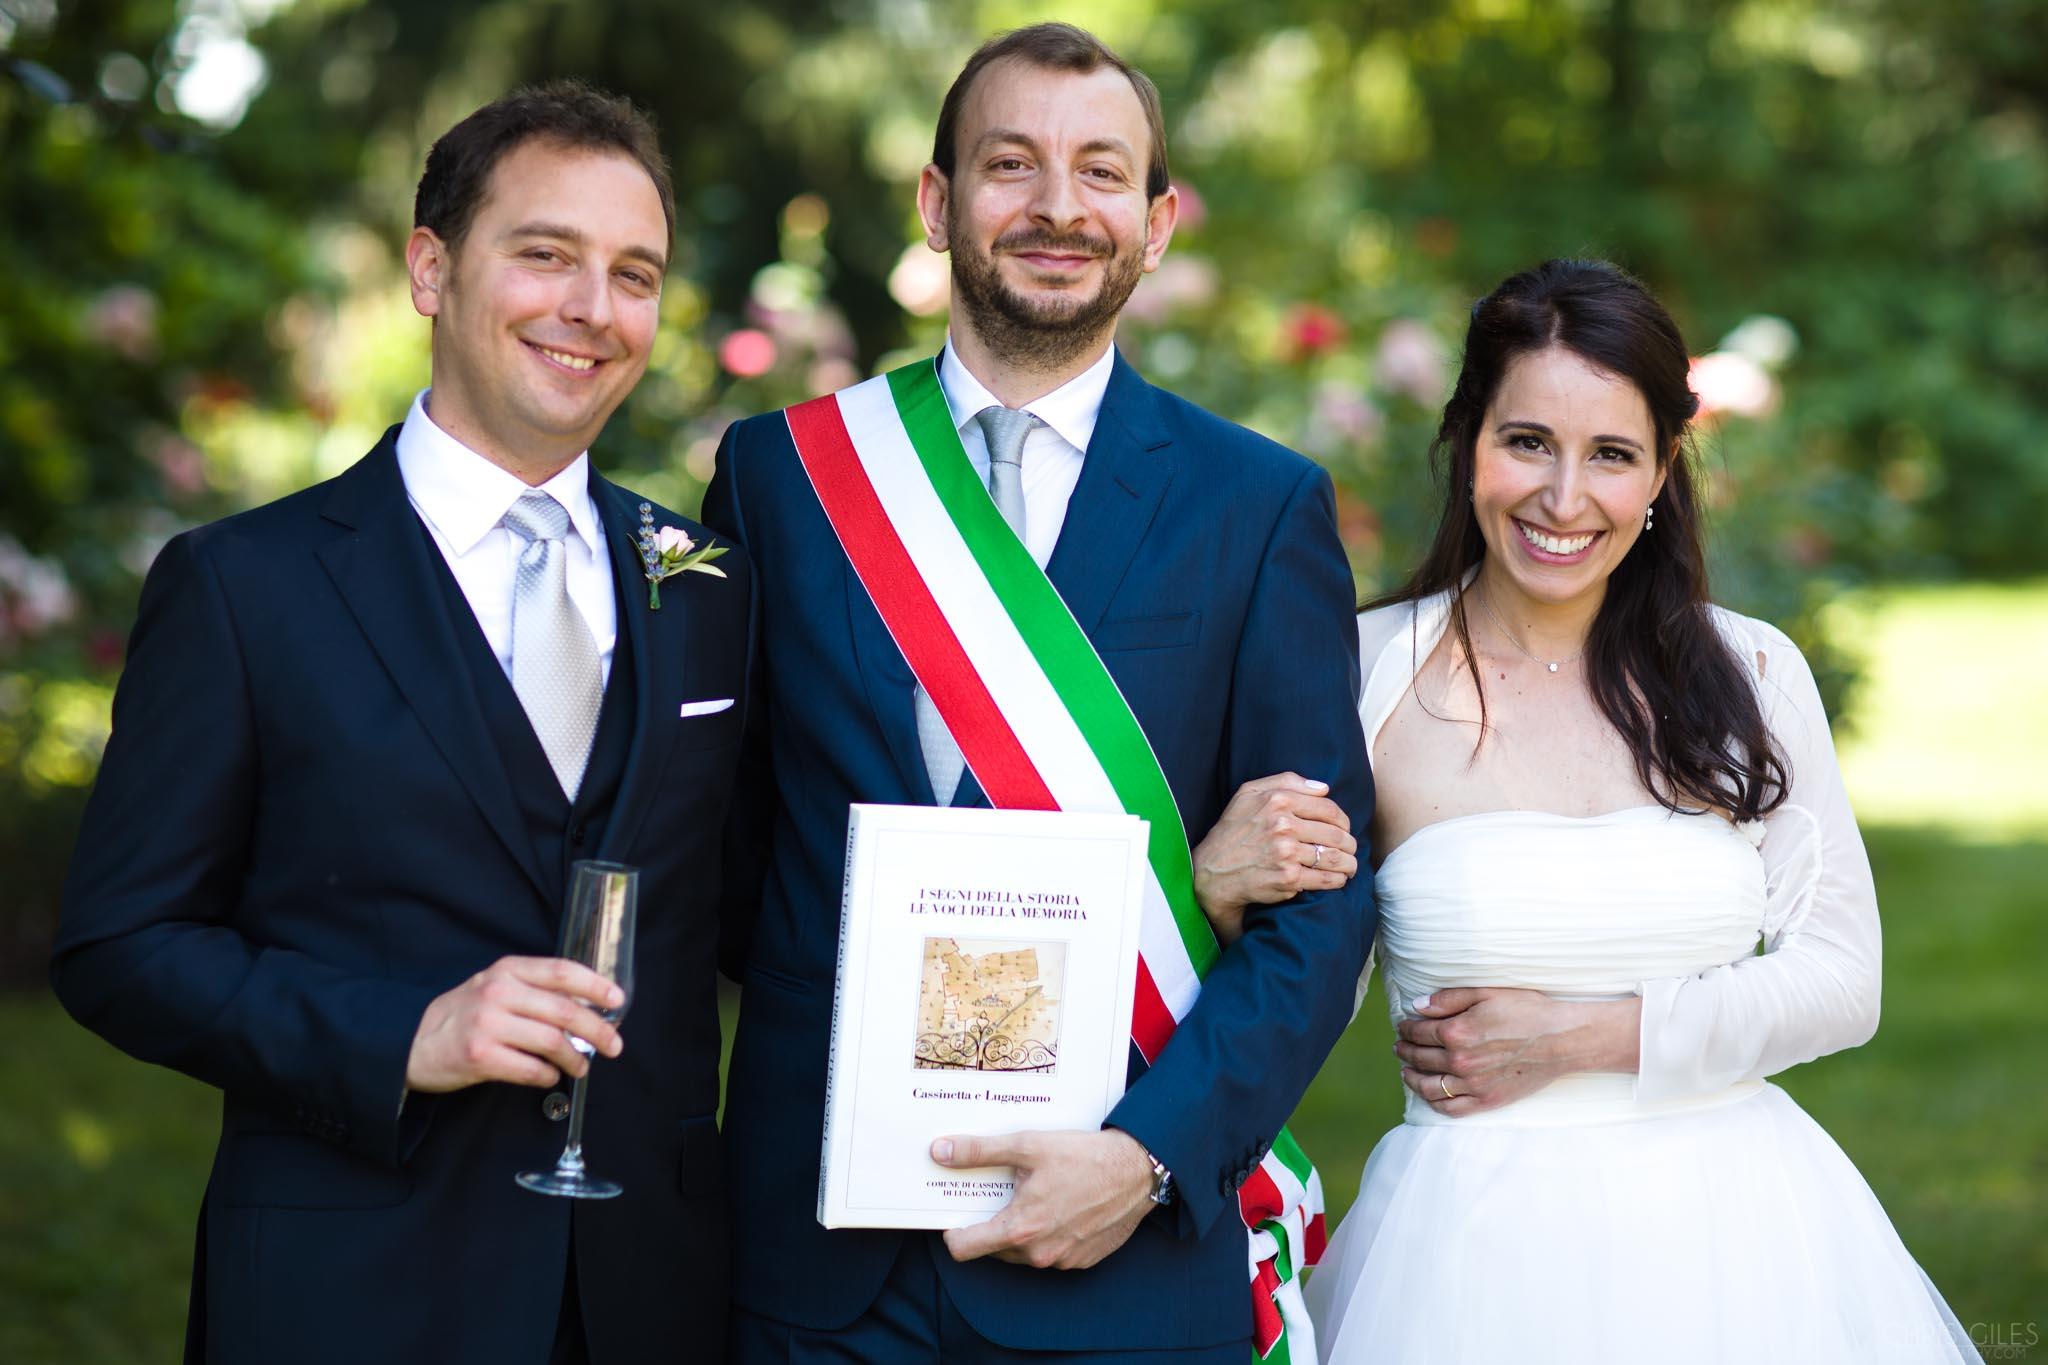 Italian formal photo